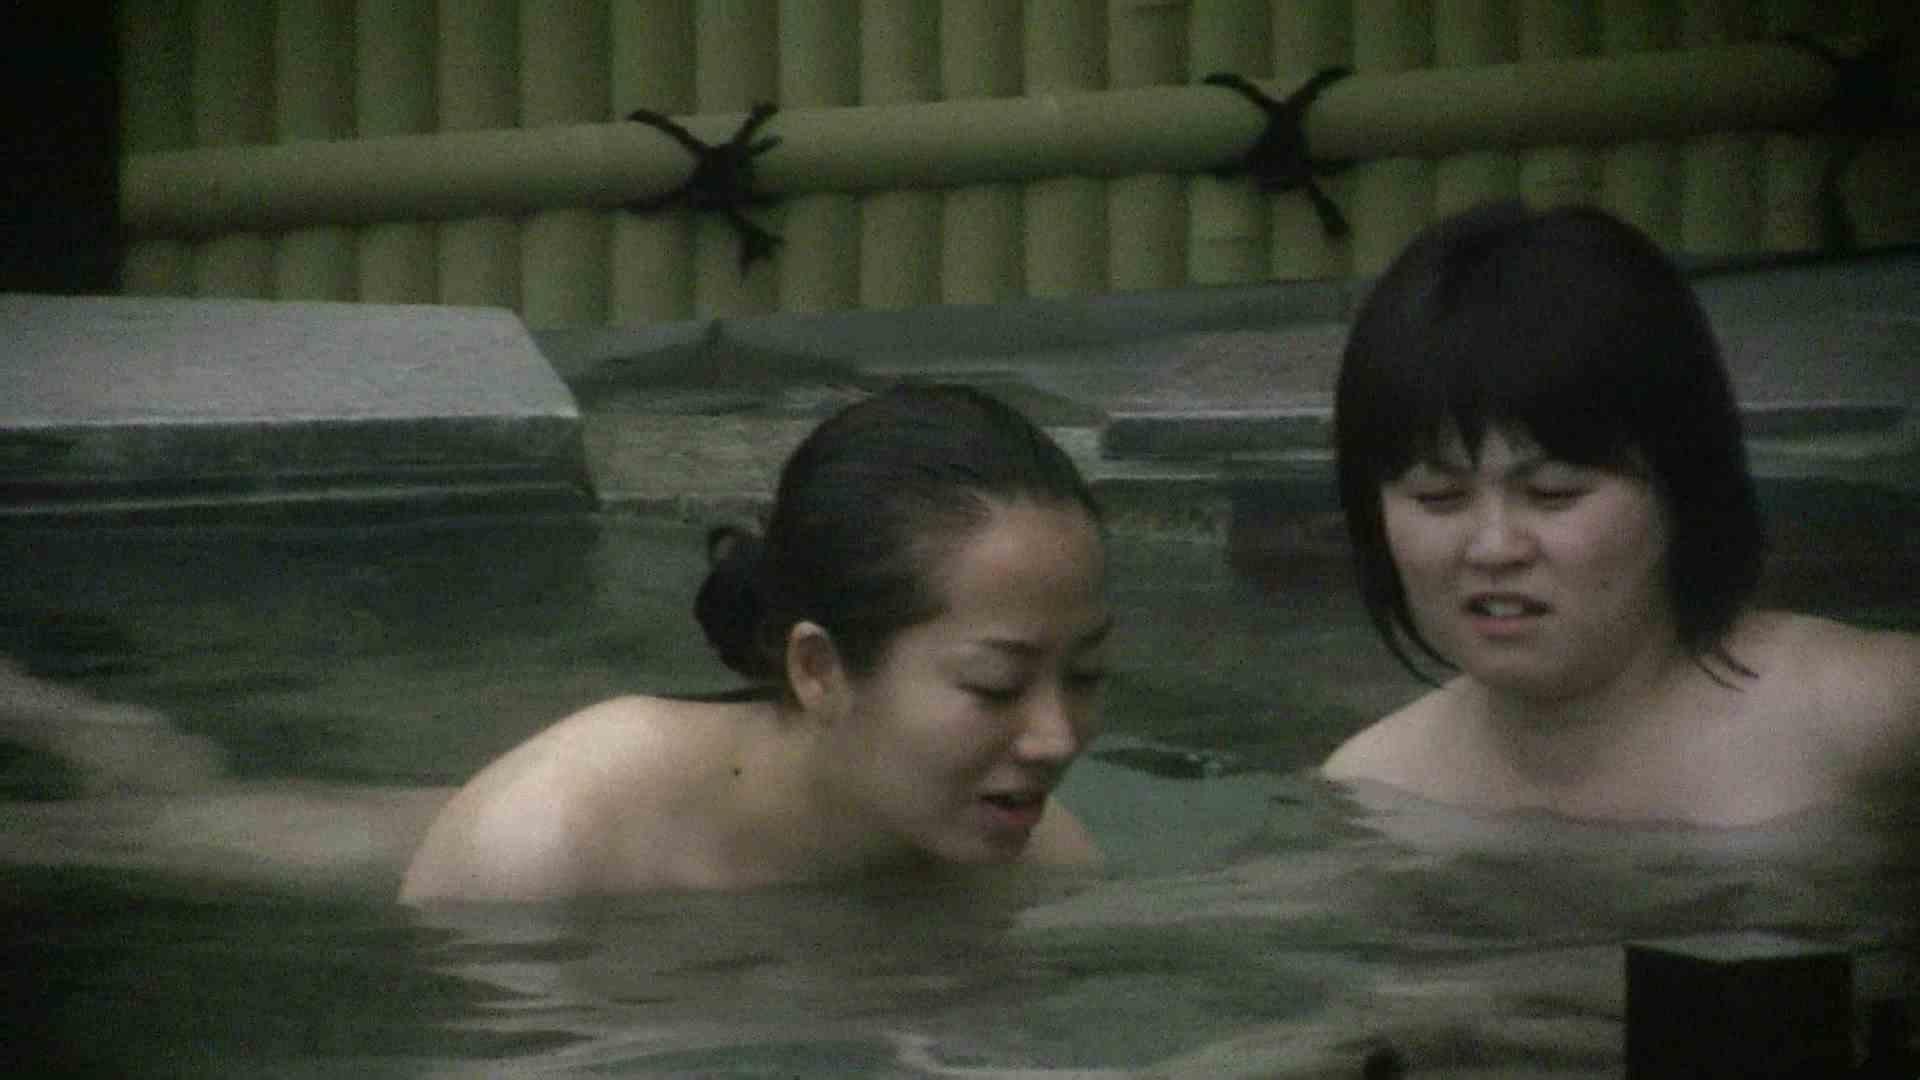 Aquaな露天風呂Vol.539 盗撮  62pic 49